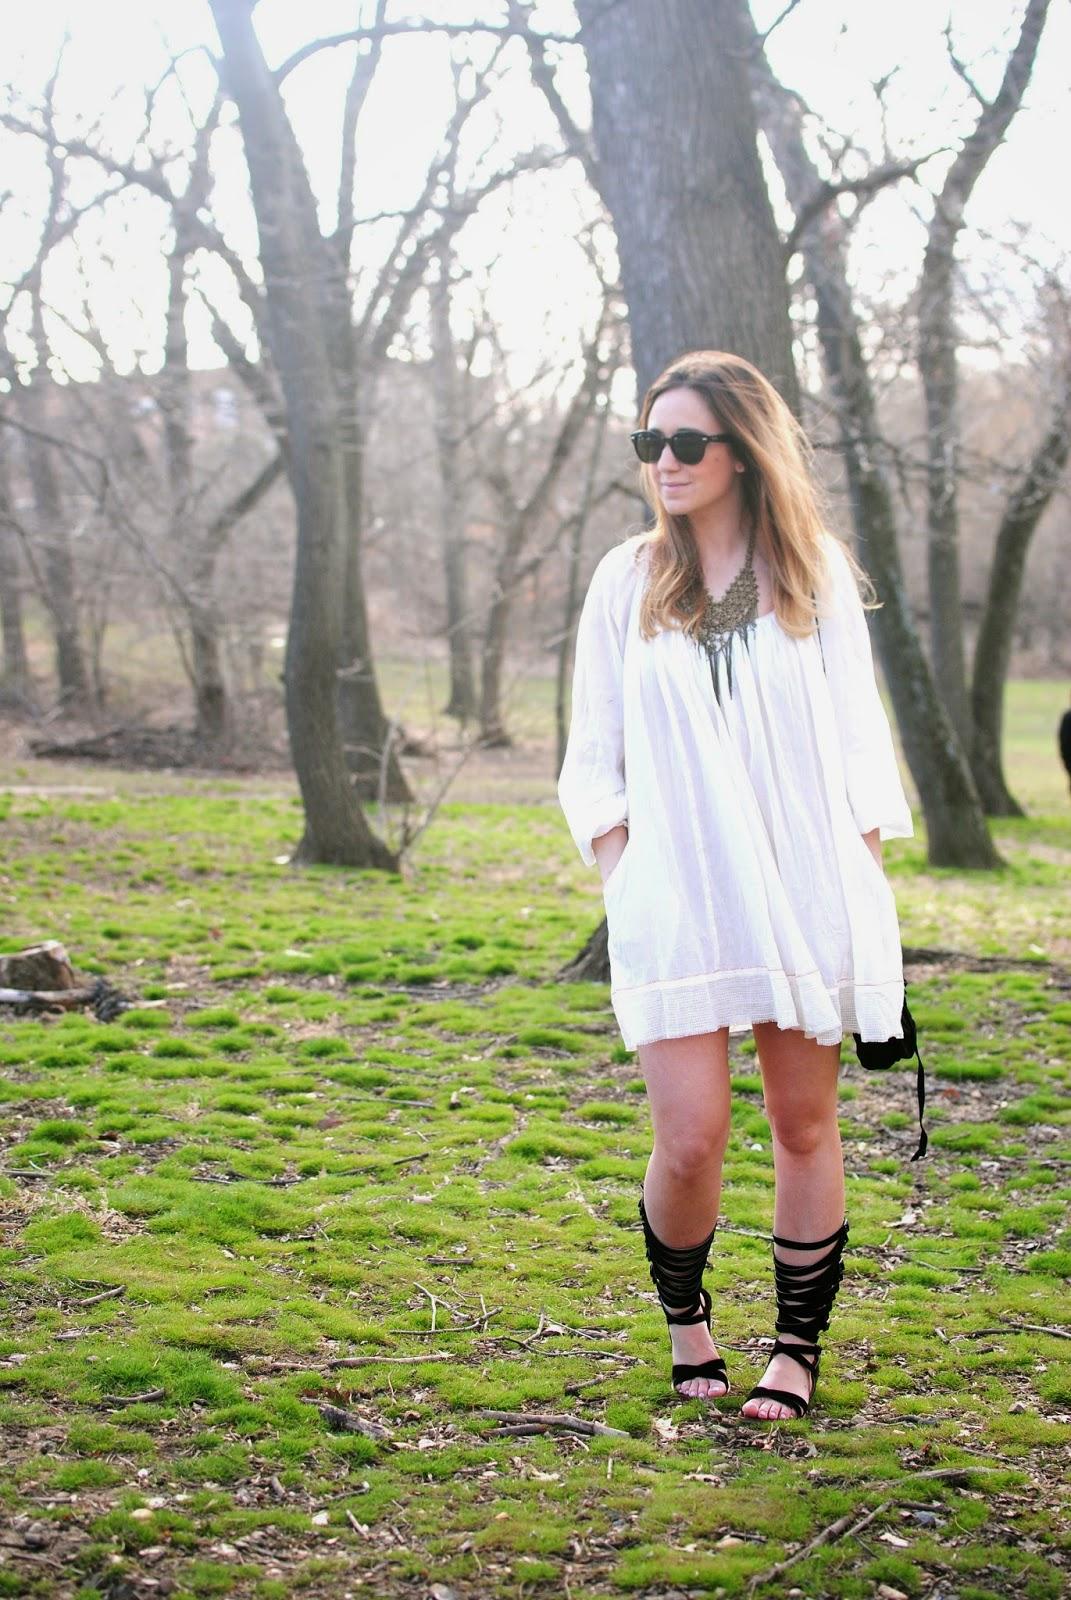 festival fashion, festival style, free people dresses, summer dress, white dress, festival blogger, coachella